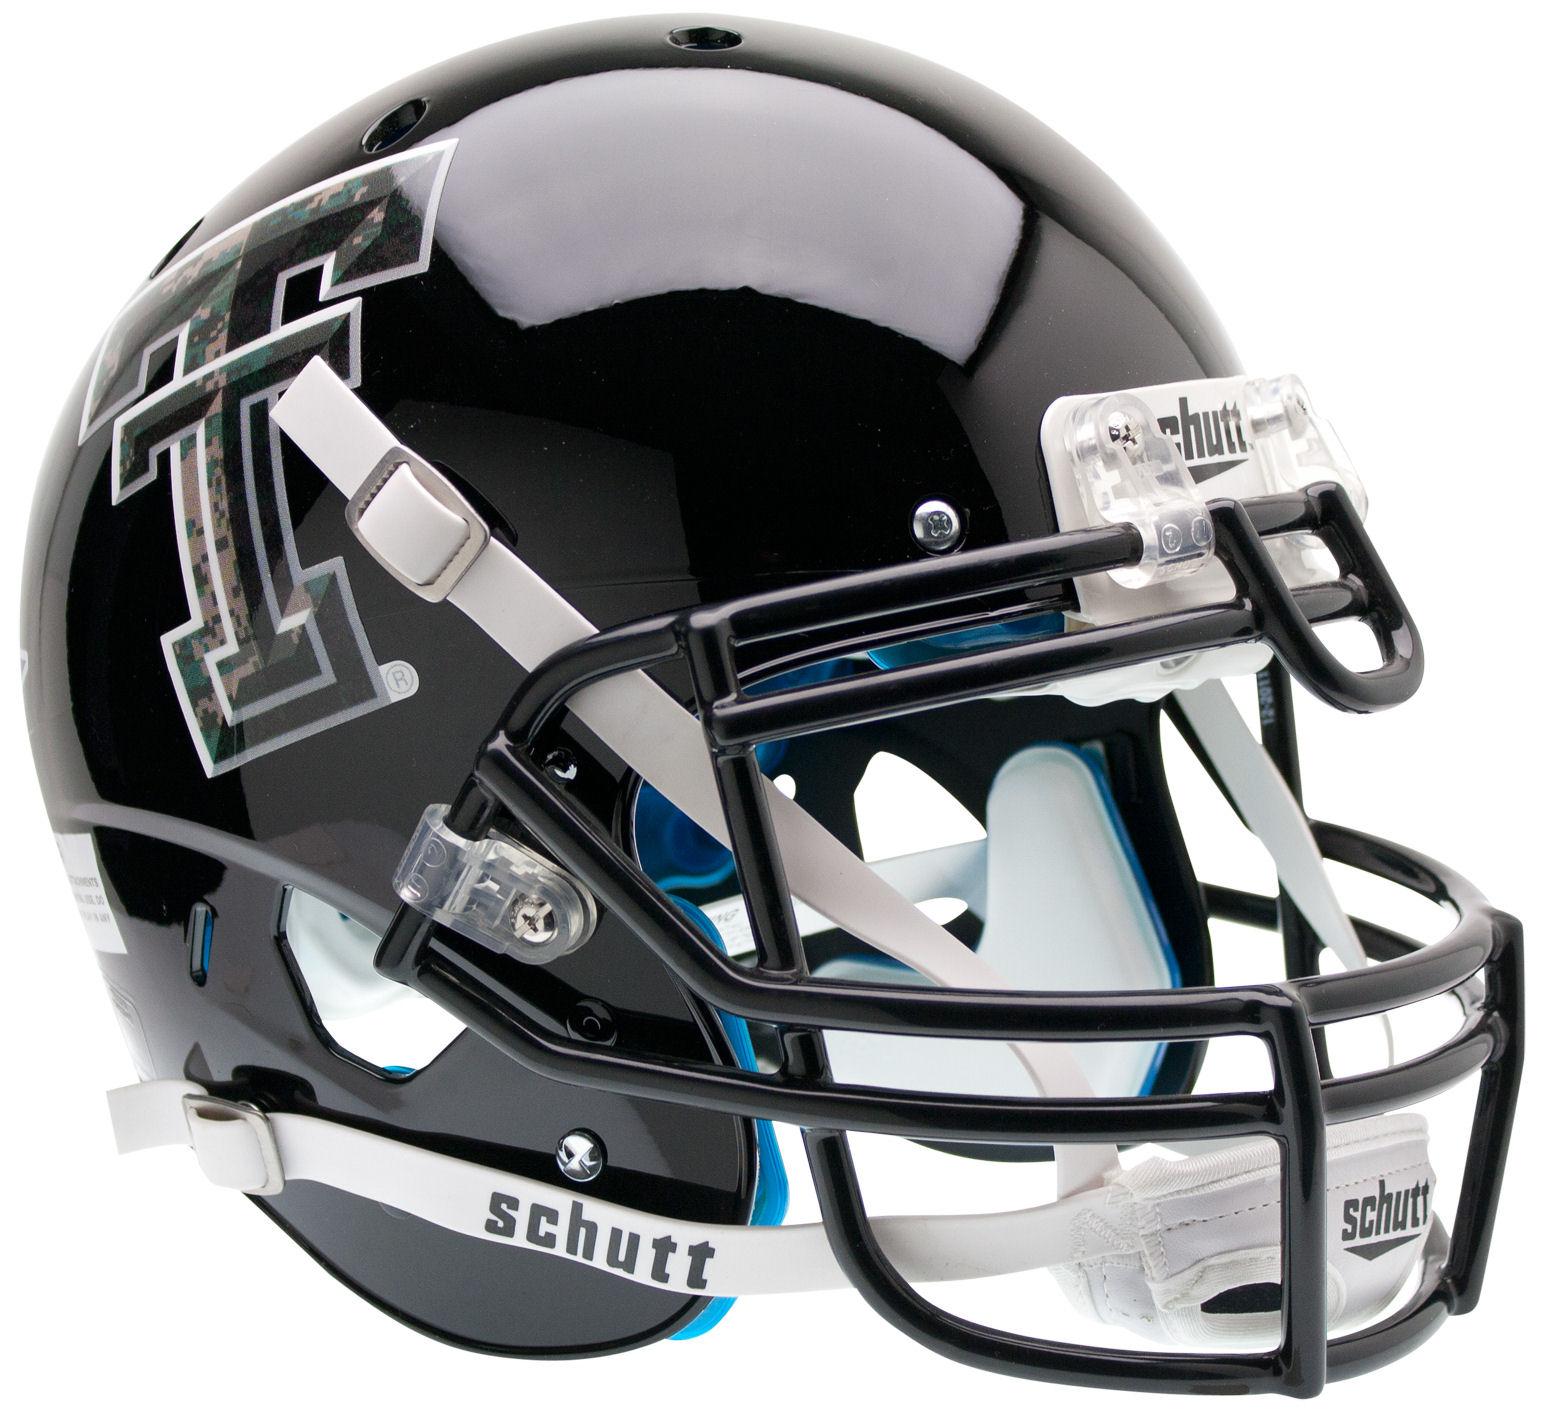 Texas Tech Red Raiders Authentic College XP Football Helmet Schutt <B>Camo Logo</B>